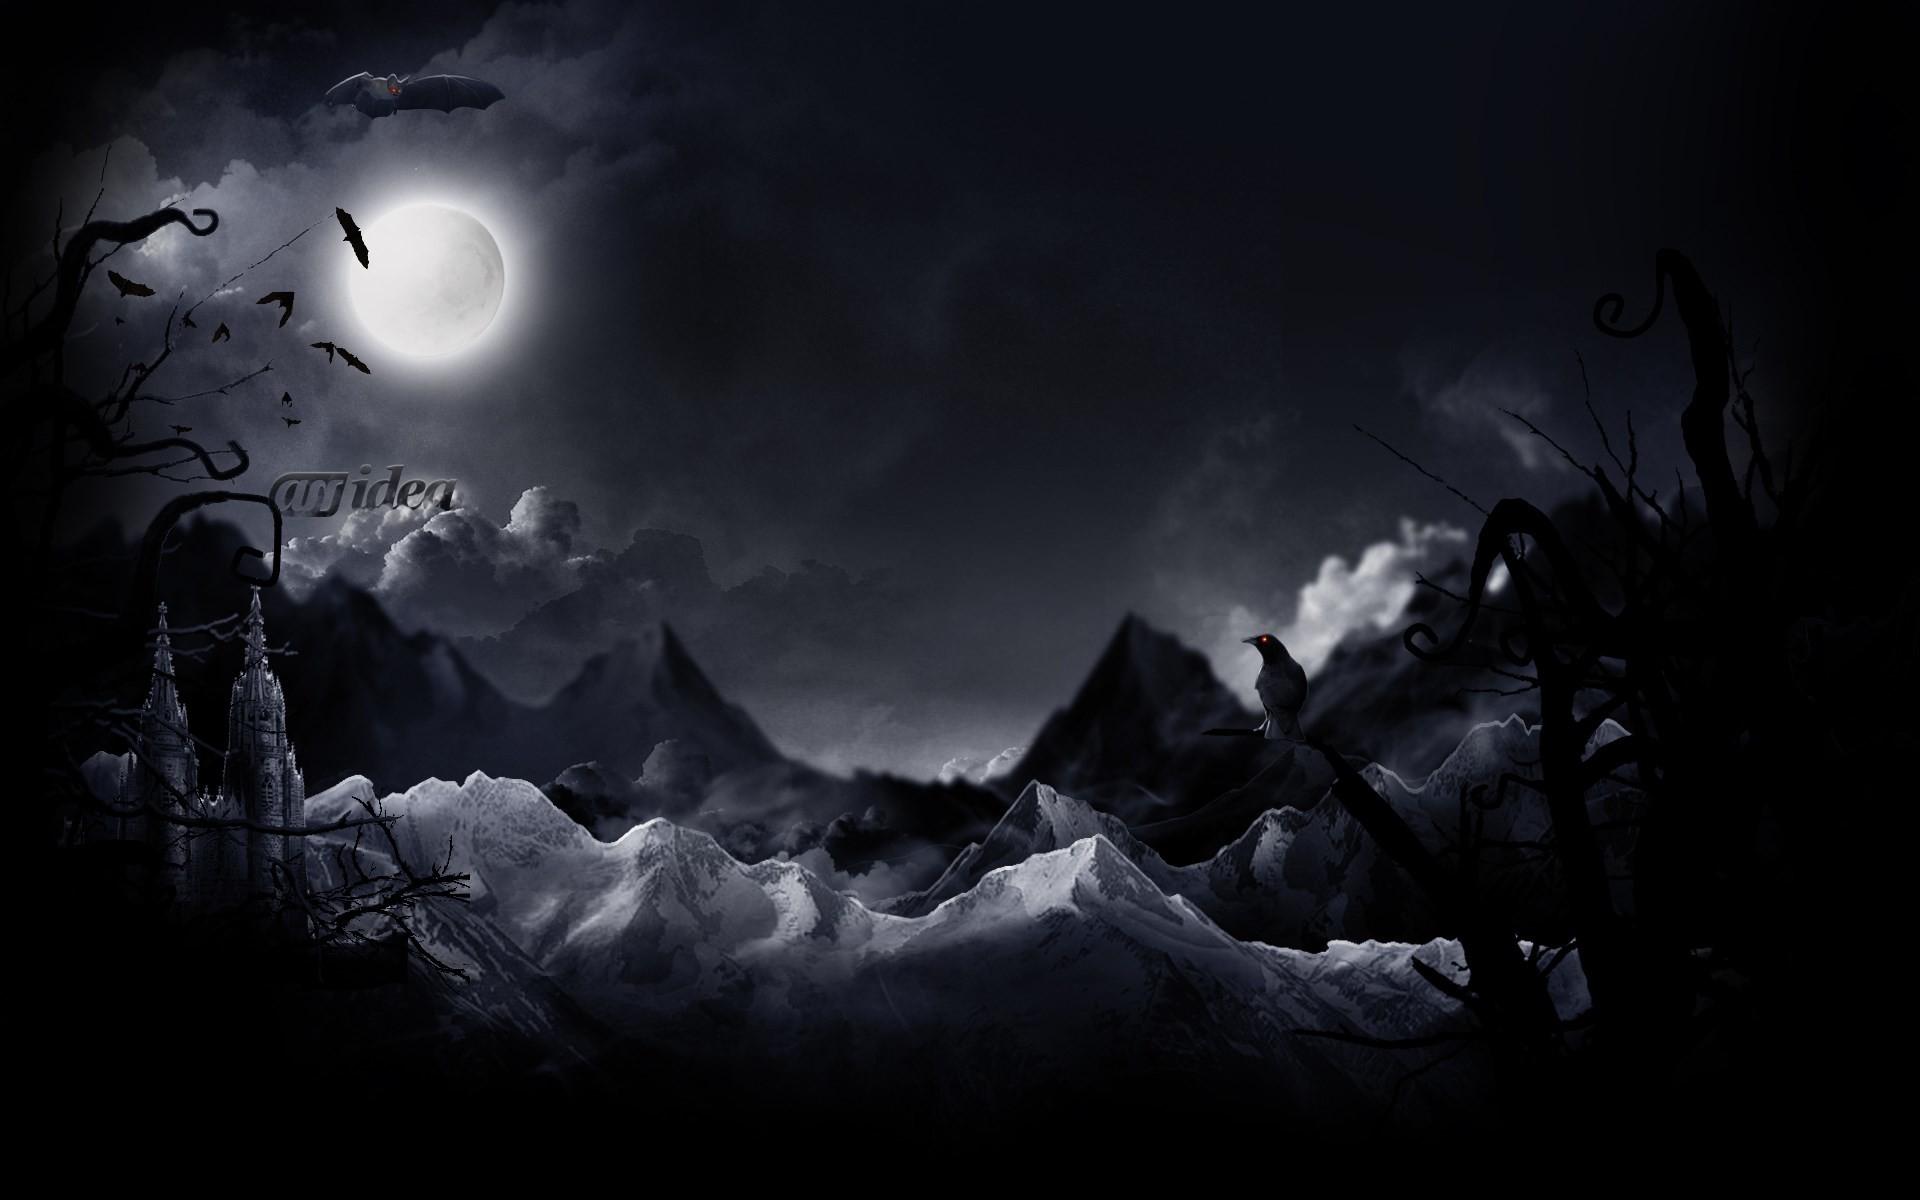 wallpaper-moon-creative-wallpapers-christian-halloween-themes.jpg